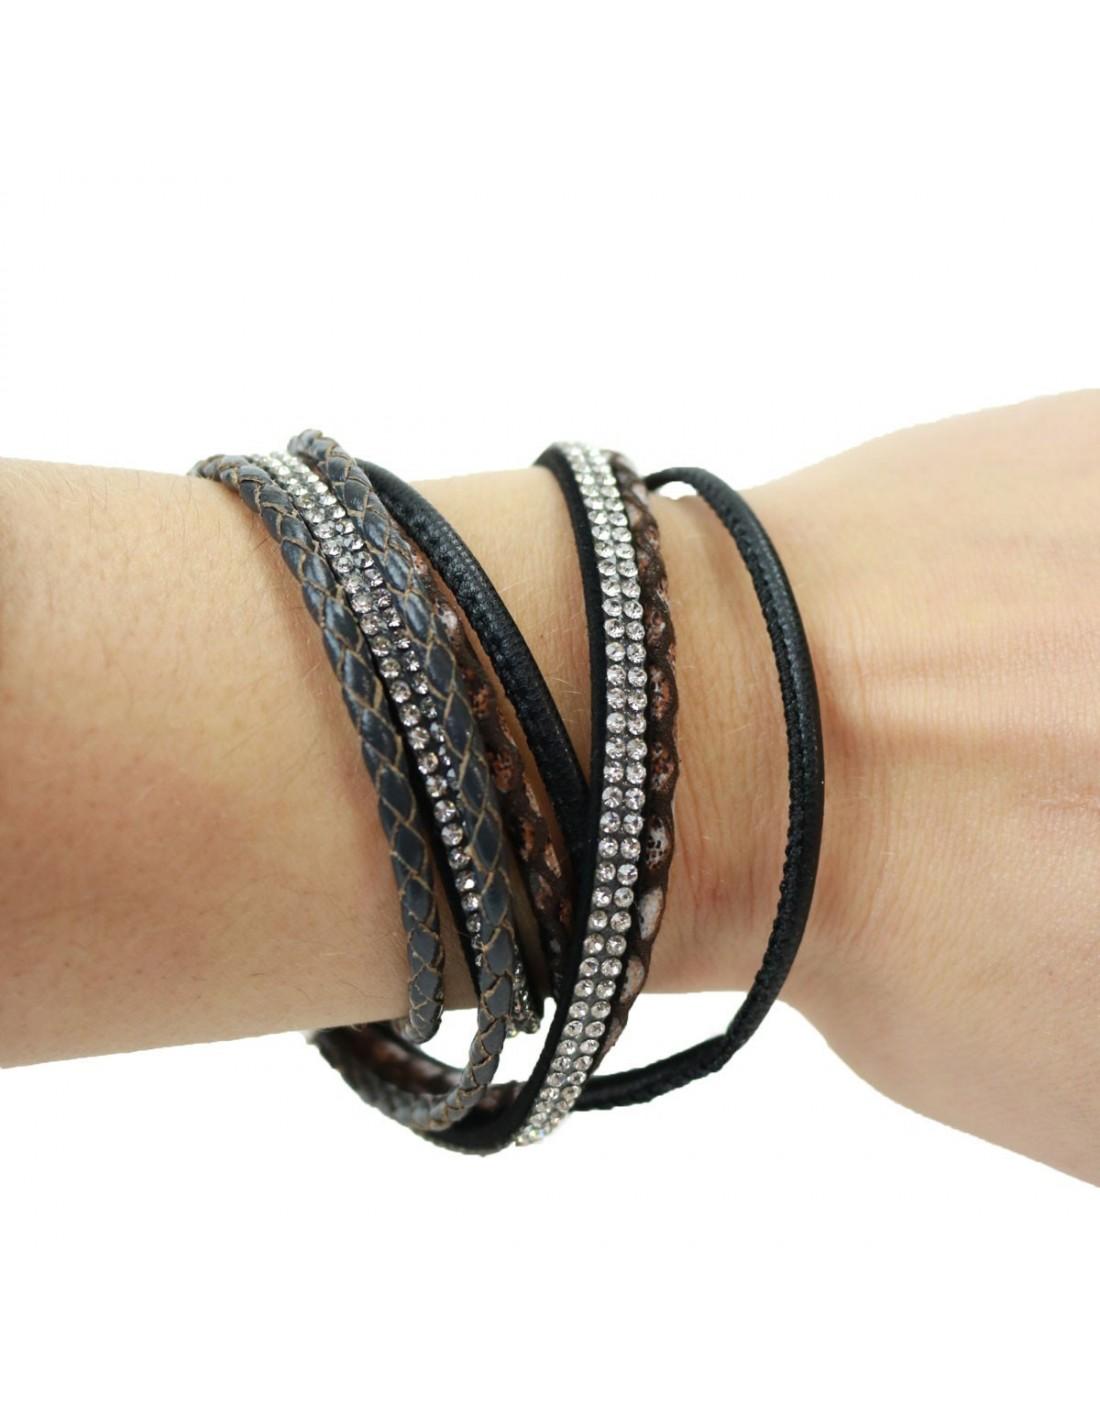 Bracelet Fantaisie Femme strass Marron